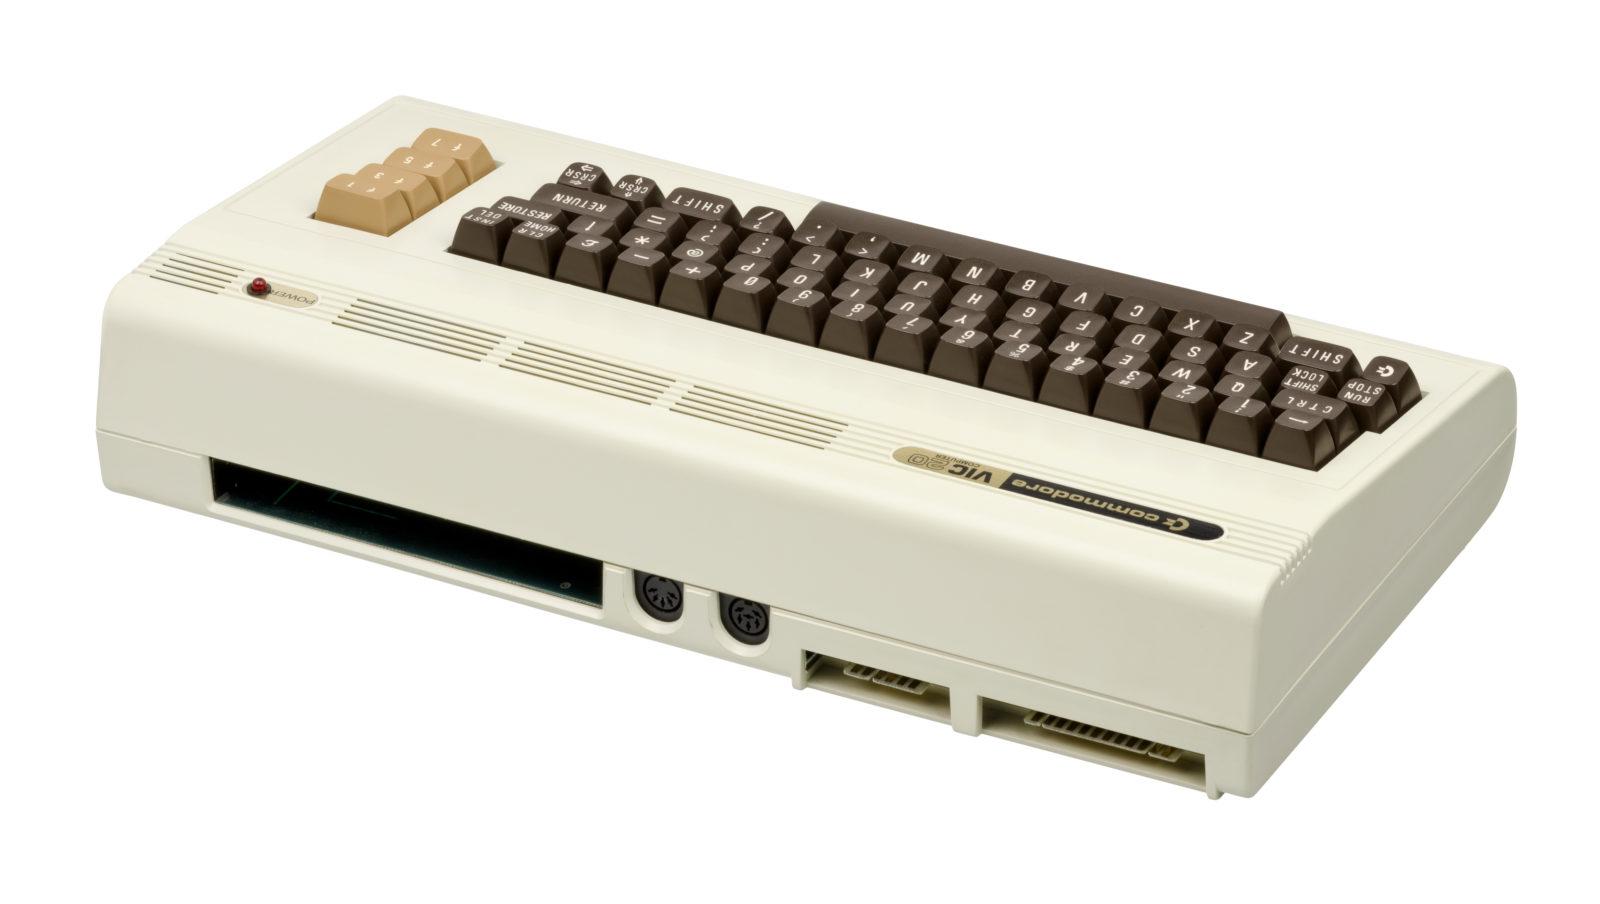 Commodore VIC-20 - HomeComputerMuseum